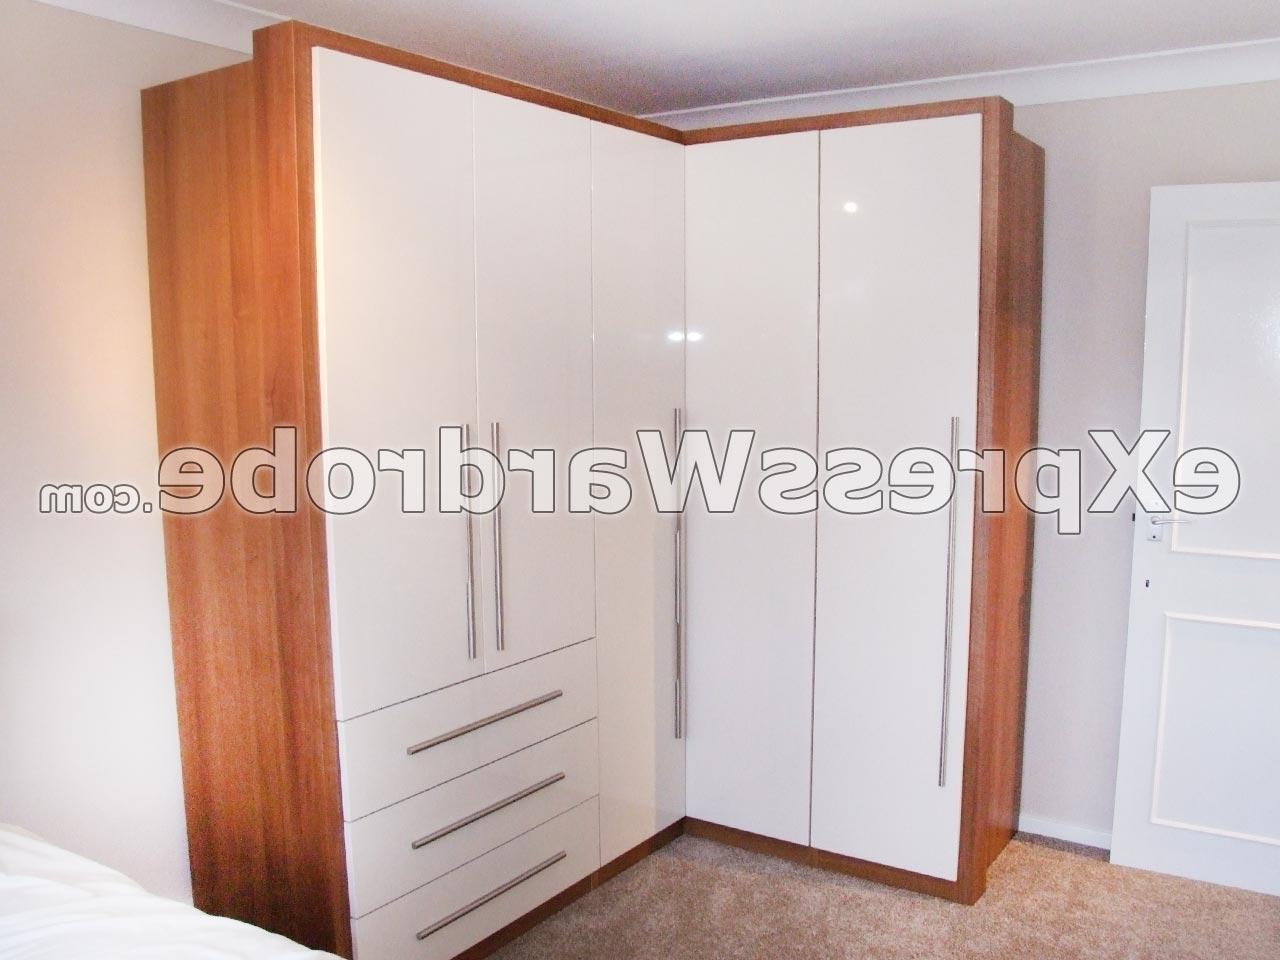 Bedroom Decor & Furnitures (View 4 of 15)